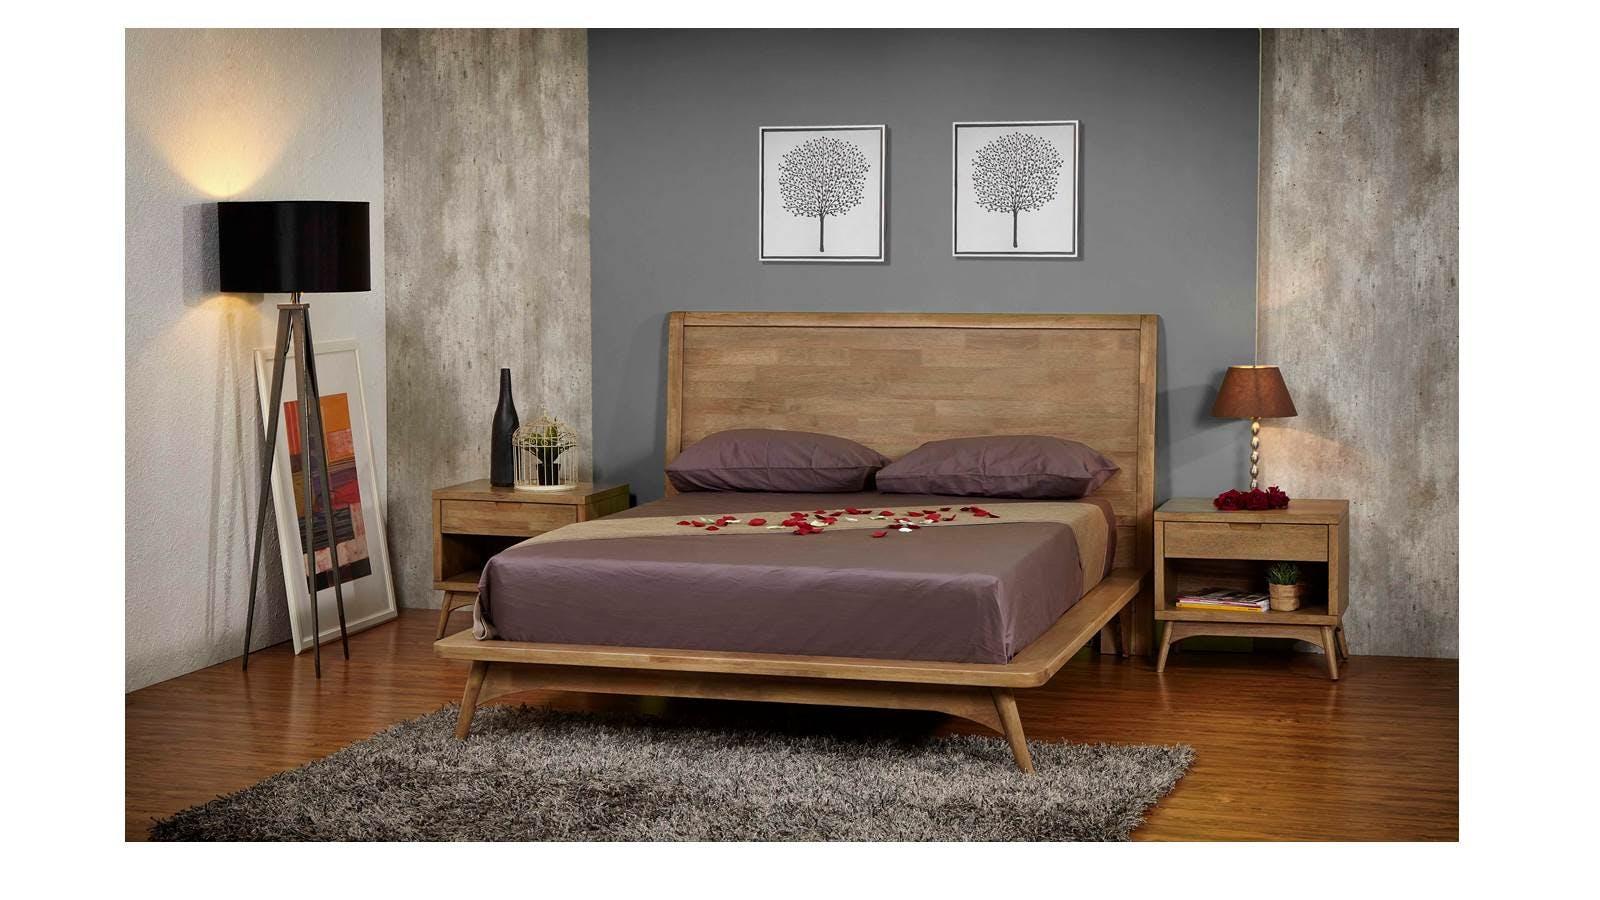 Lavo king bed frame harvey norman malaysia lavo king bed frame jeuxipadfo Choice Image